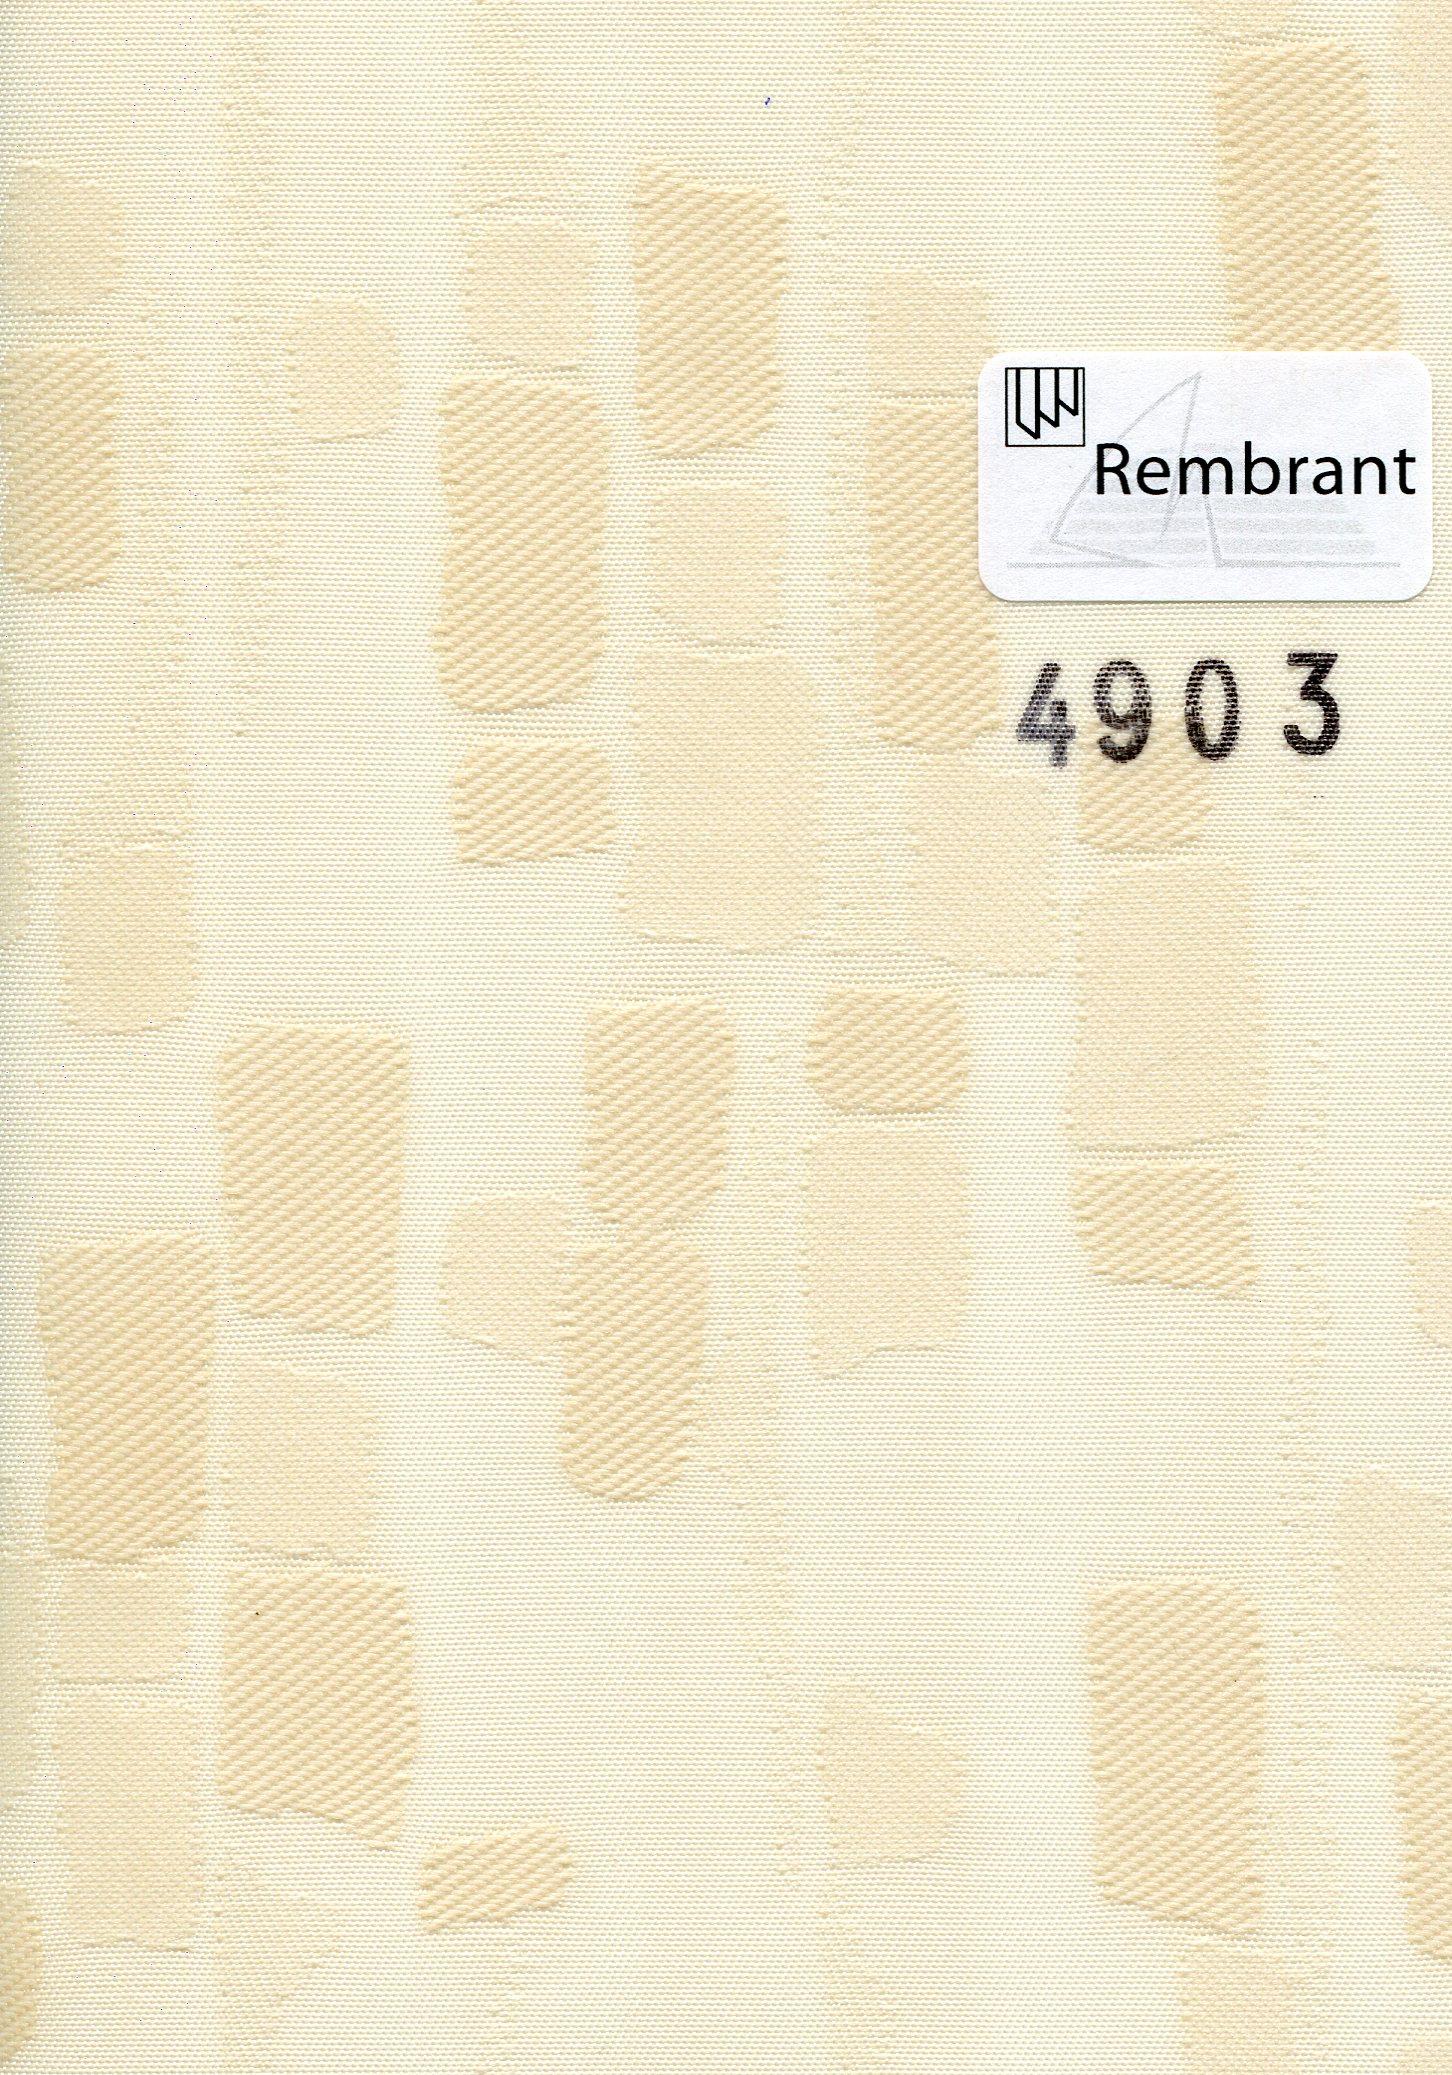 Rembrant 4903